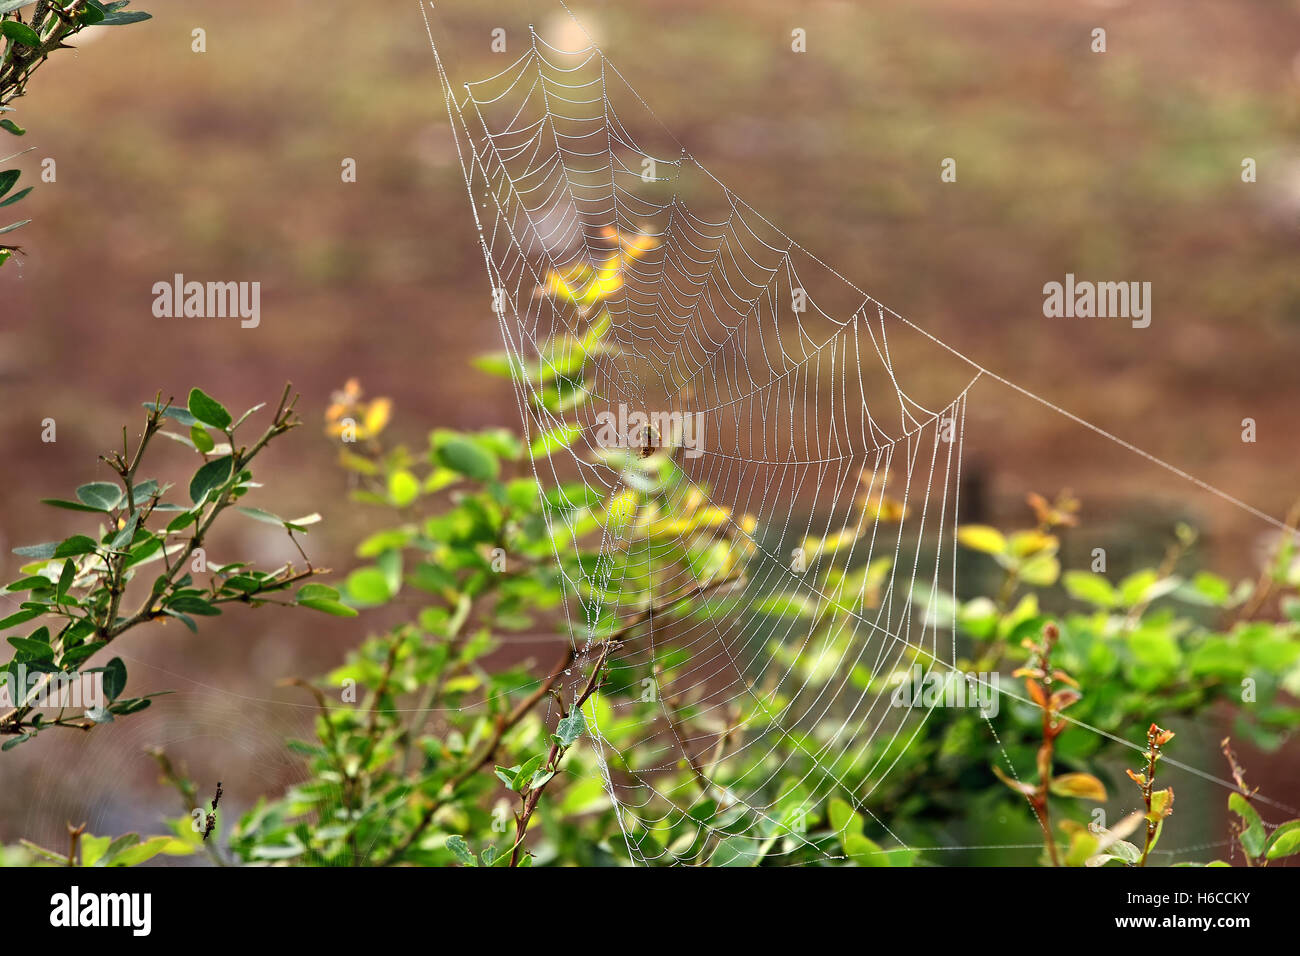 Glistening spider web with dew drops among bush vegetation on autumn morning - Stock Image